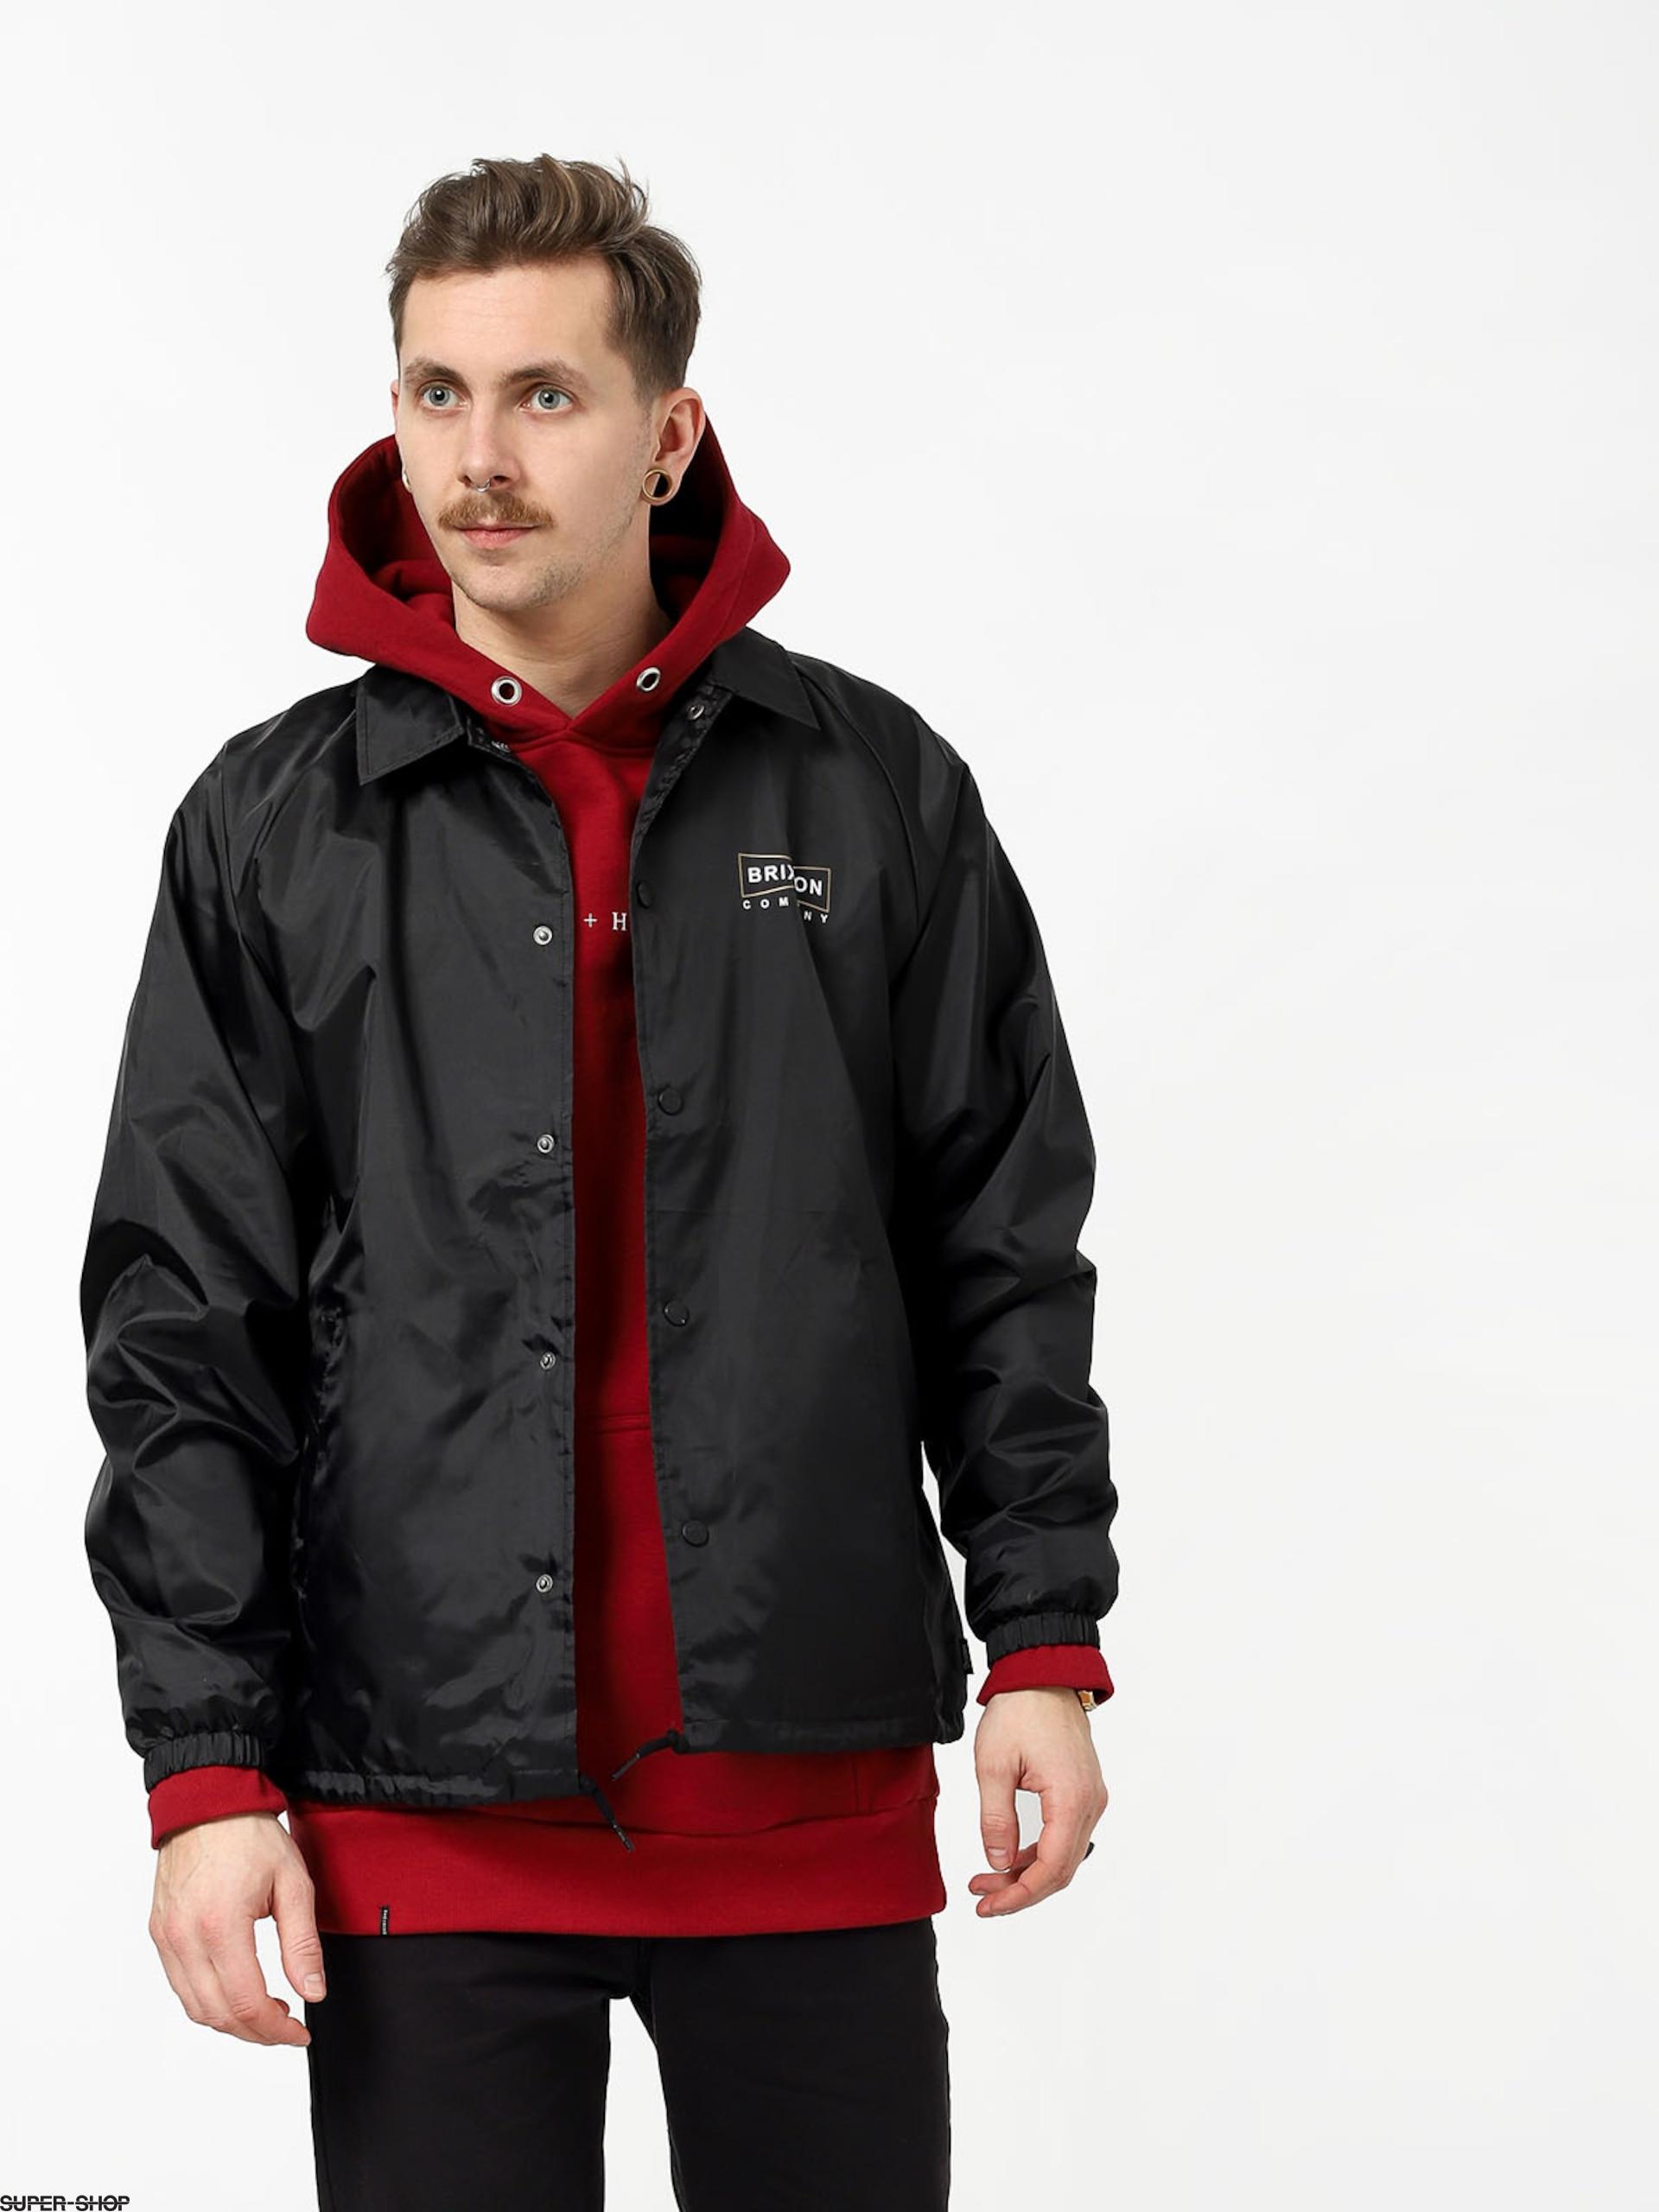 8a3694097 1009152-w1920-brixton-wedge-jacket-black-bronze.jpg